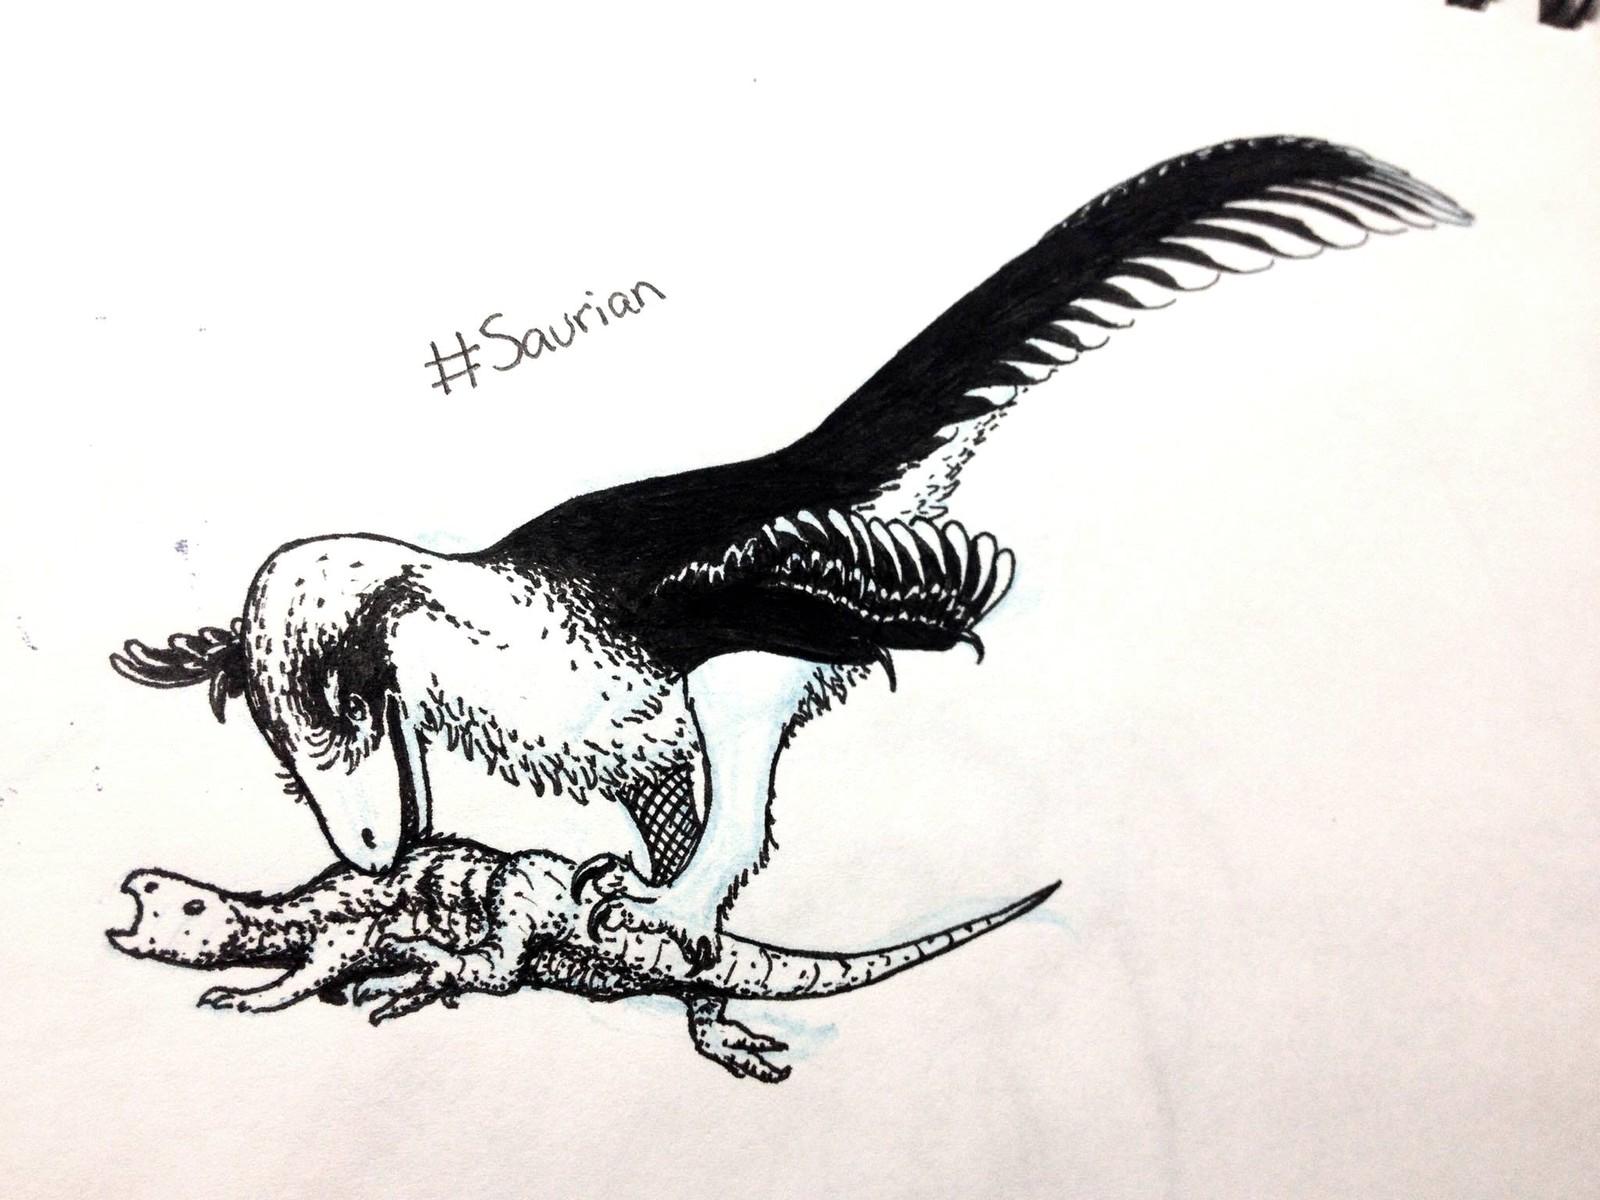 Saurian's Dakotaraptor attacking small herbivore